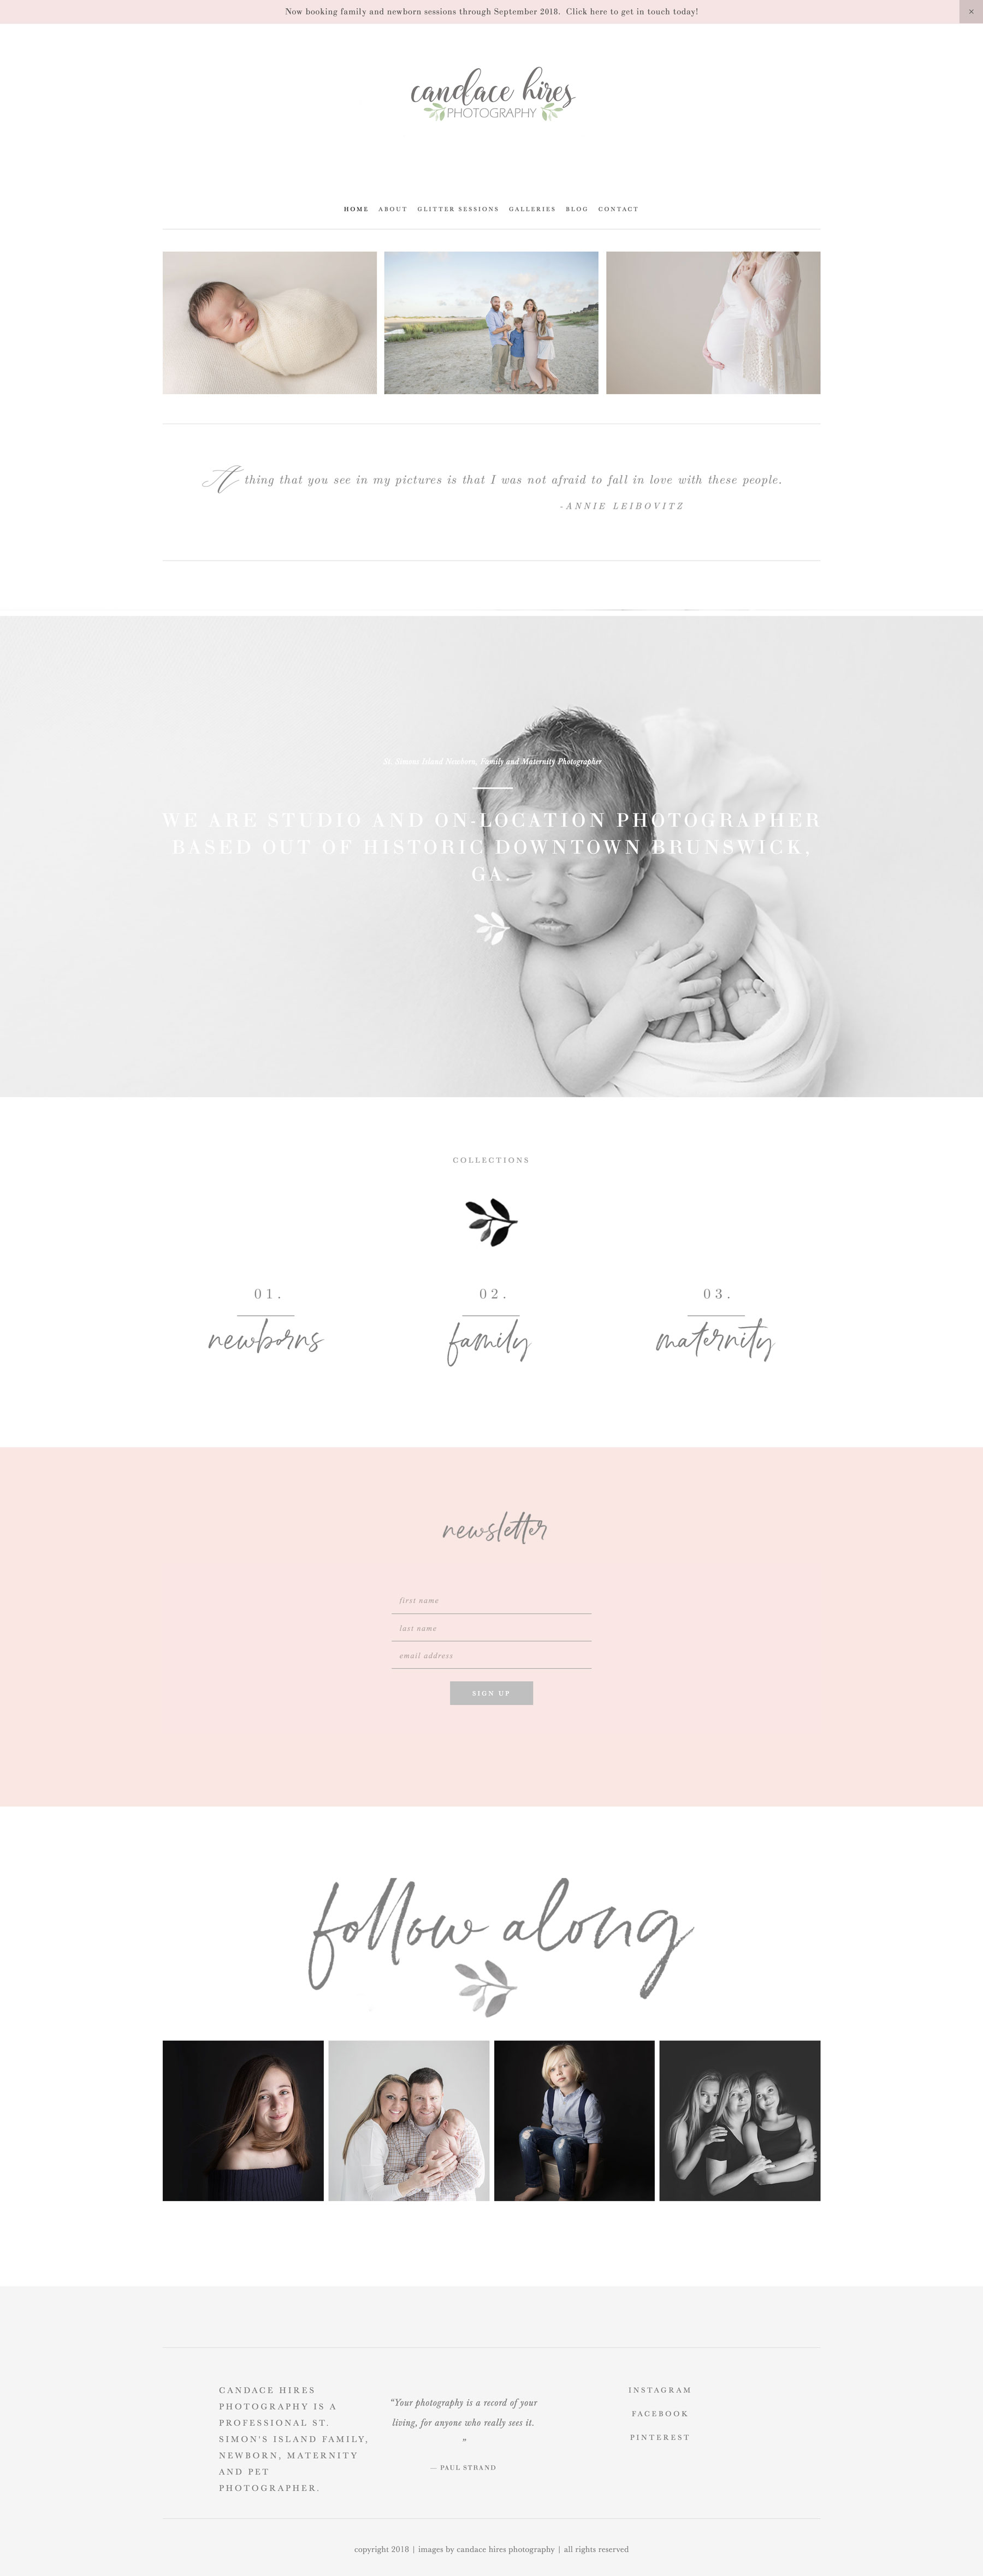 squarespace-website-design-ideas.jpg